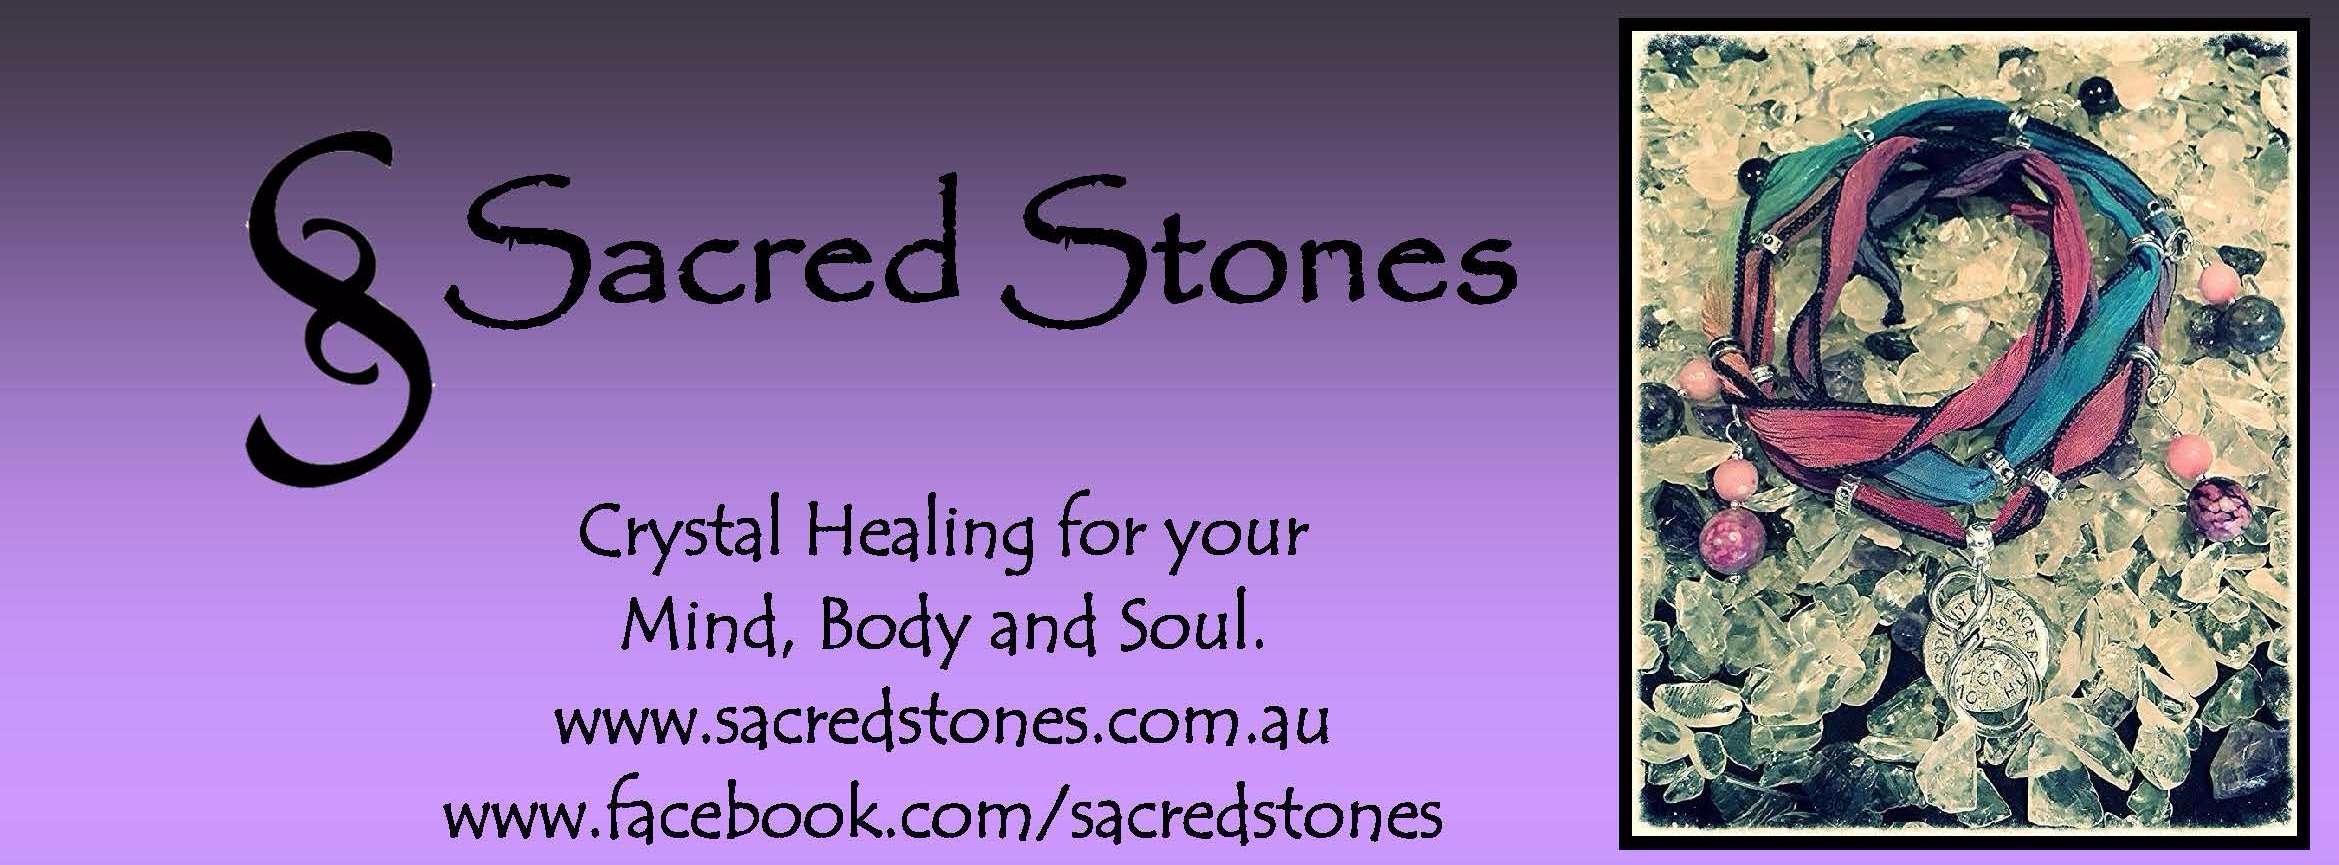 Sacred Stones (@sacredstones) Cover Image